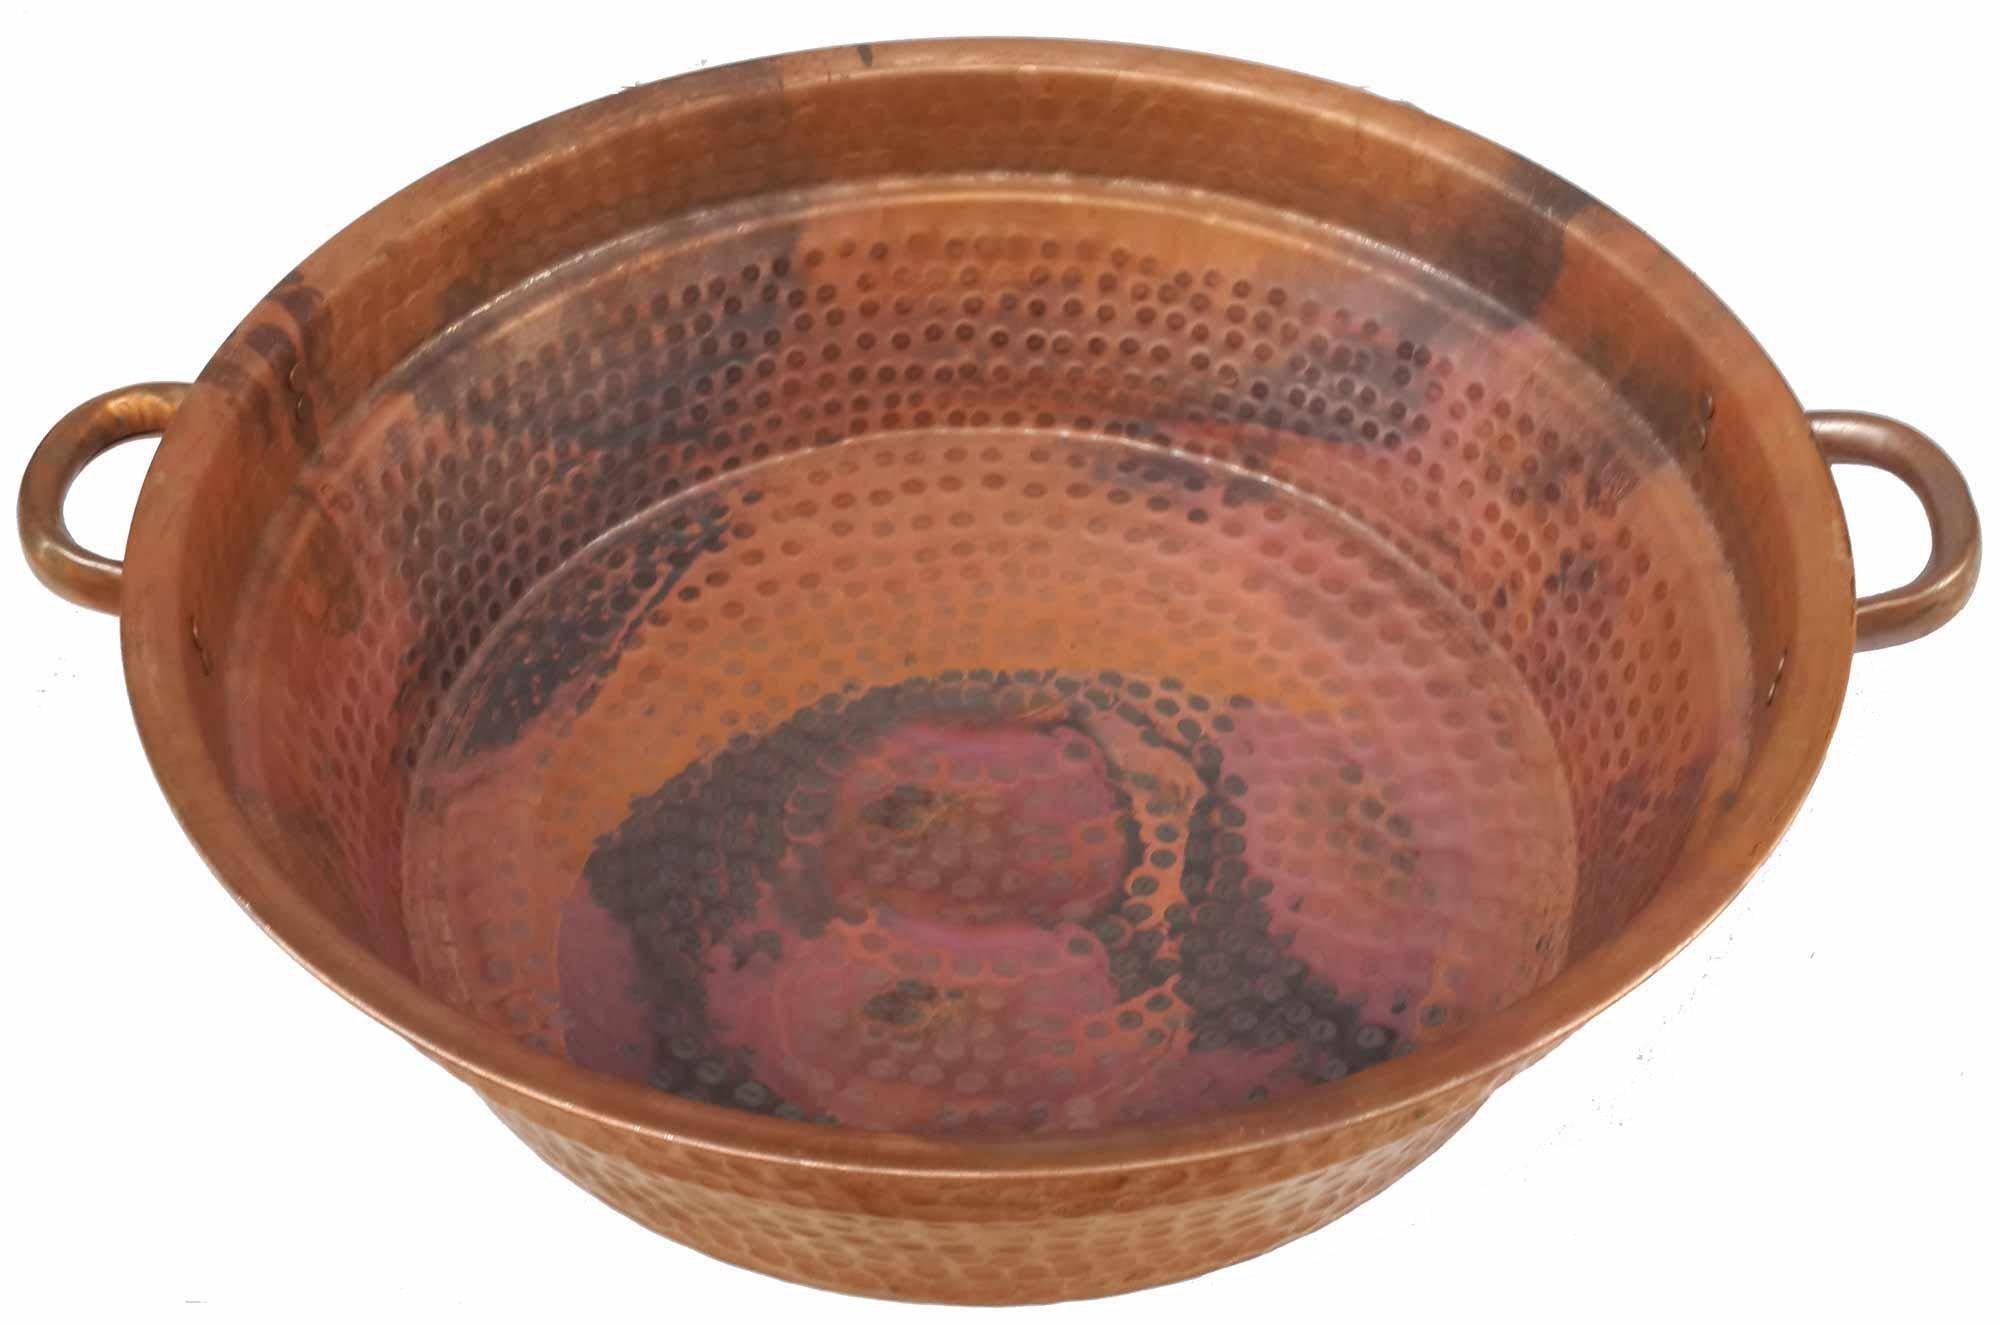 Egypt gift shops Copper Foot Soak Wash Spa Styling Salon Massage Pedicure Bowls Healthy Wash Pot Garden Planter Water Storage Skin moisturizing